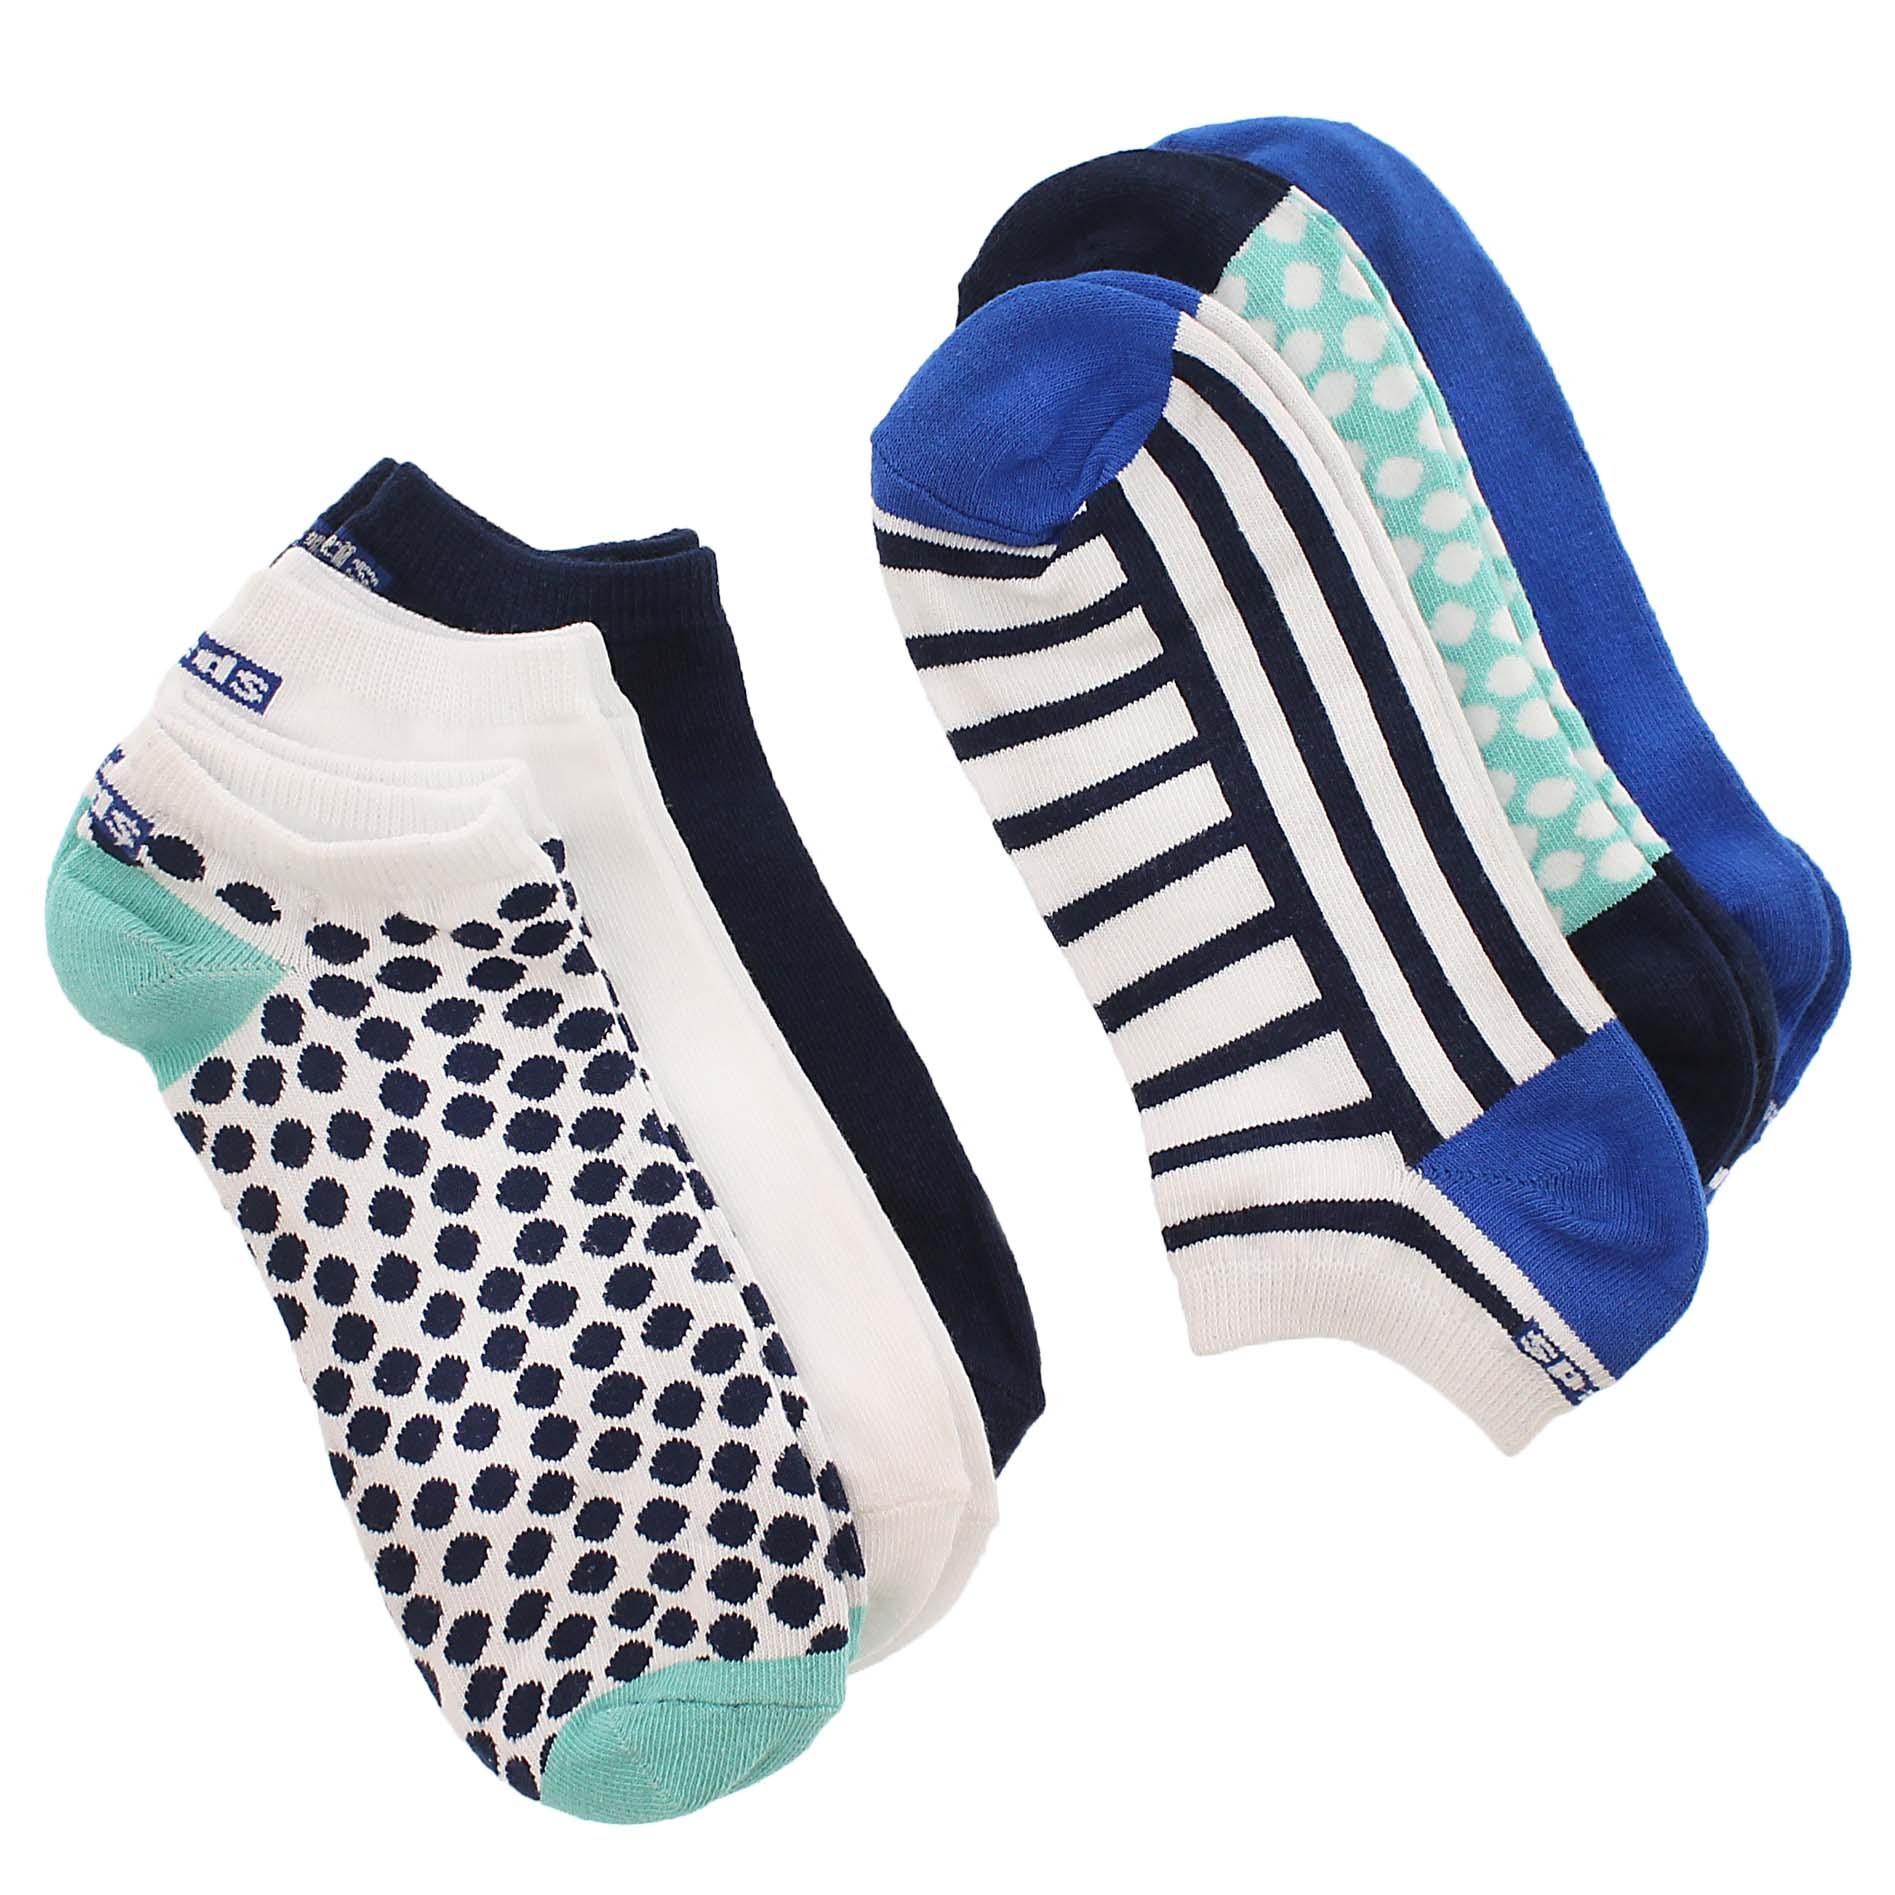 Lds turquoise no show cotton socks - 6pk